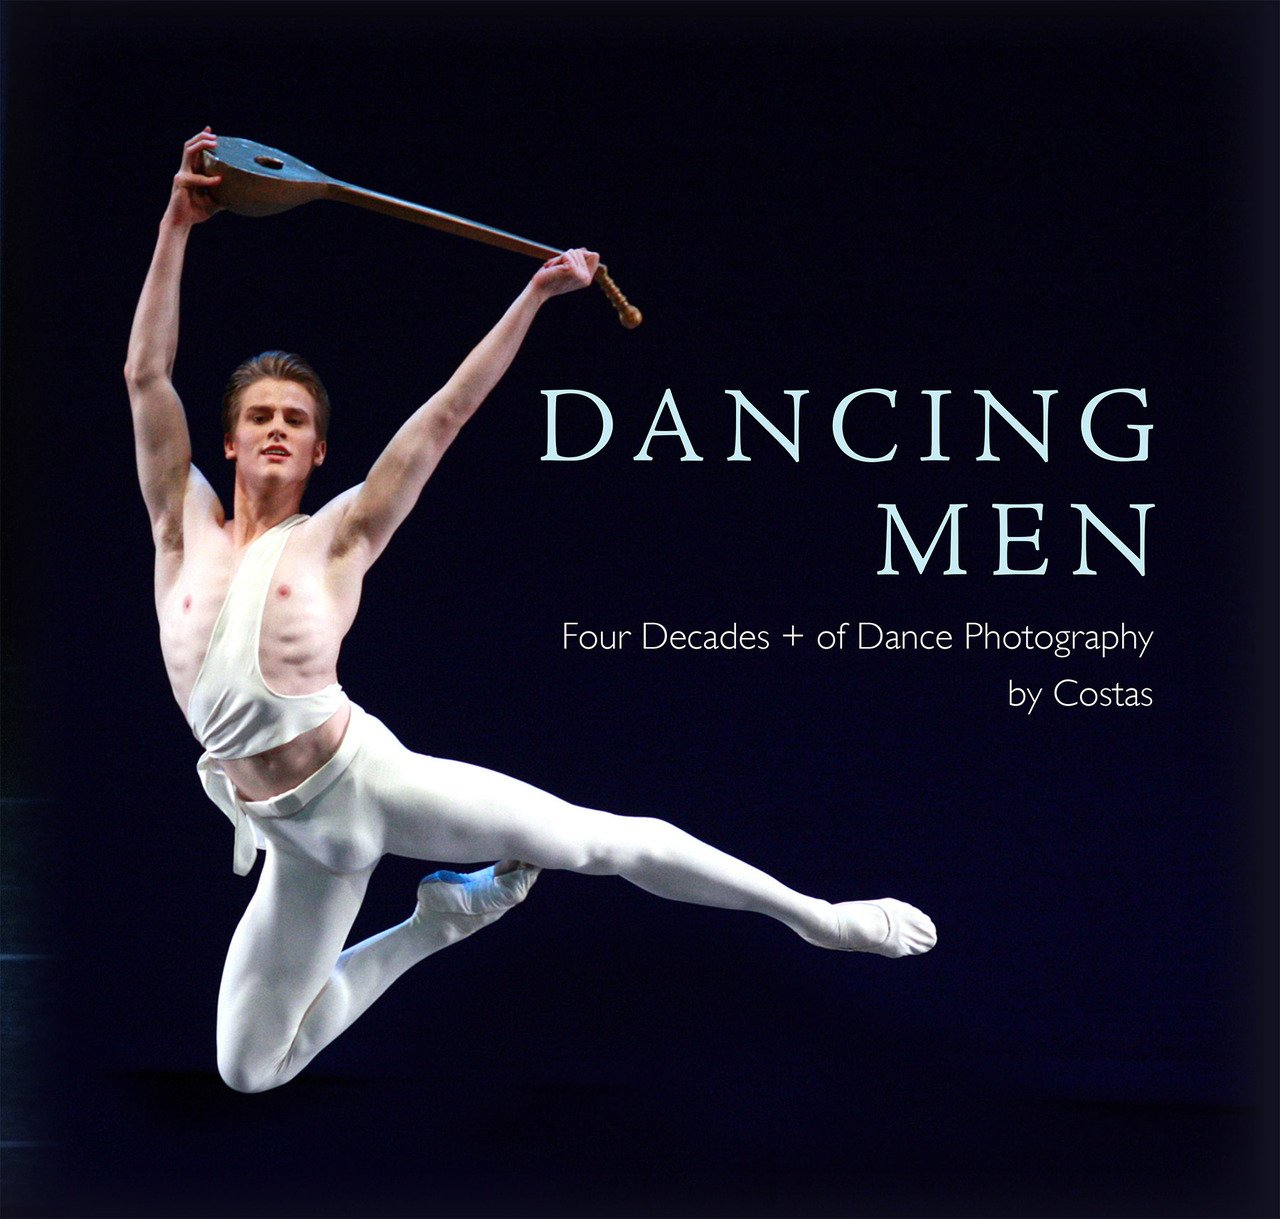 Amazon.com: Dancing Men: Four Decades + of Dance Photography  (9781631140310): Costas, Costas, Costas: Books